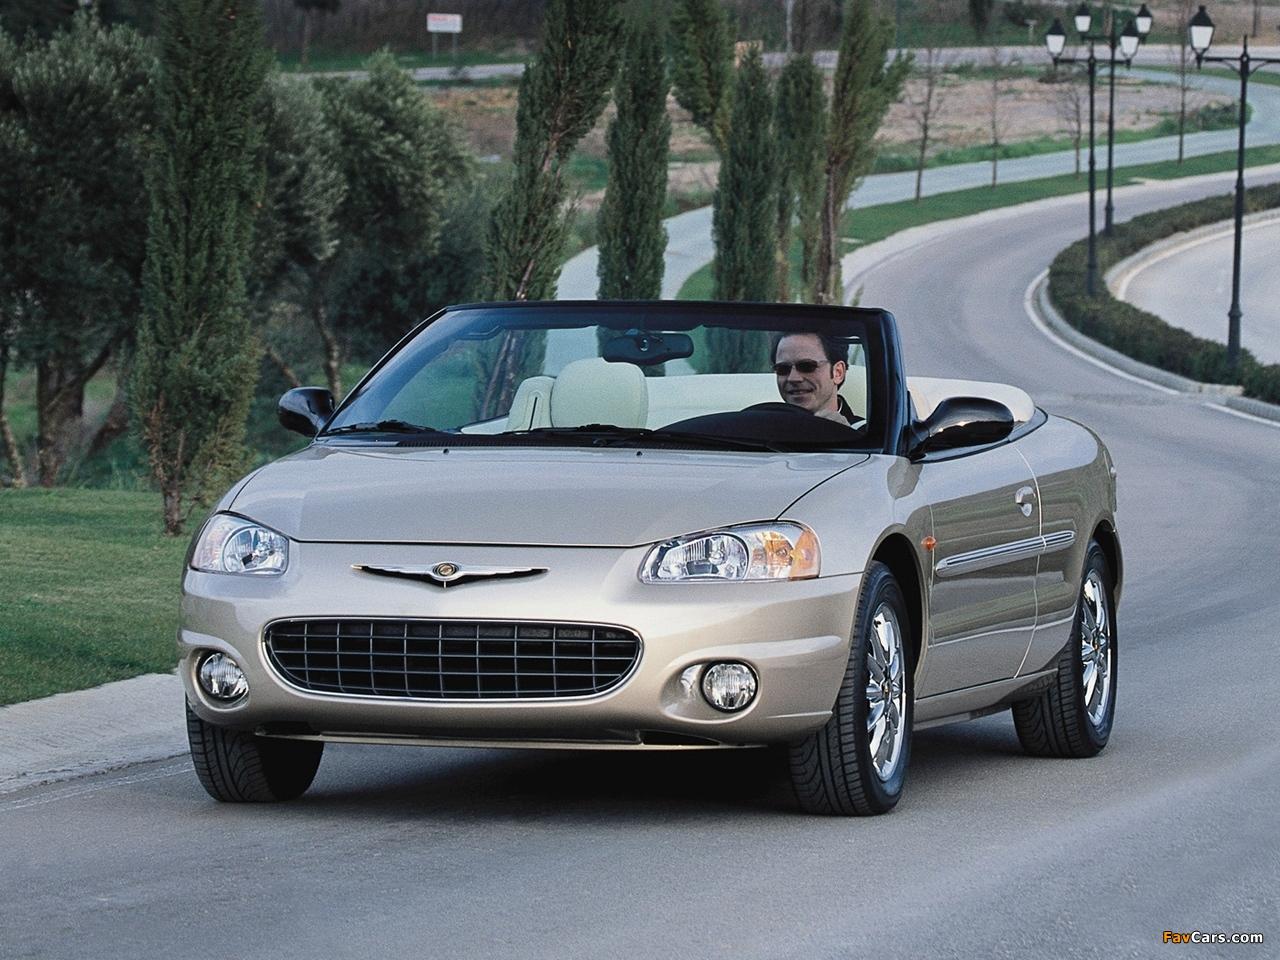 Chrysler Sebring Convertible 2001–04 images (1280x960)